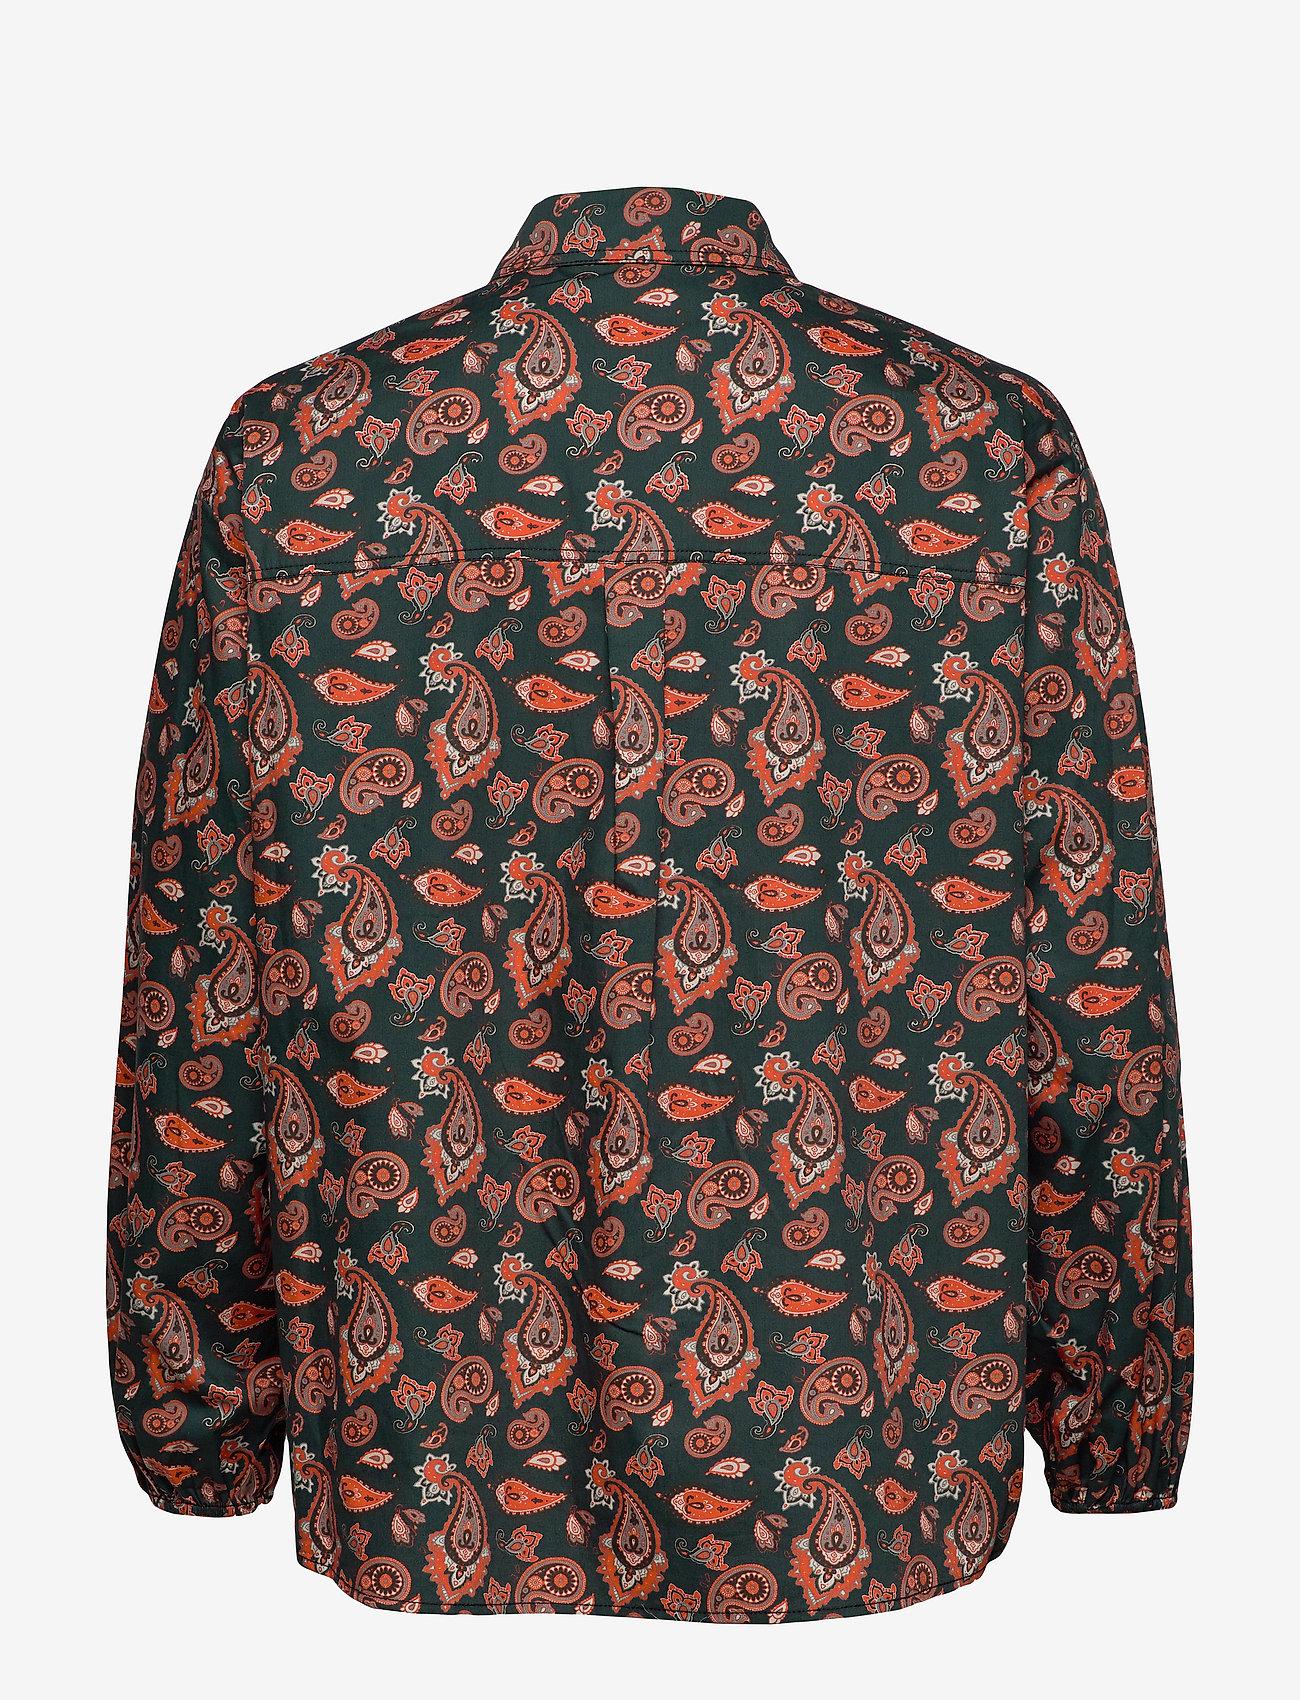 Envii Enclara Ls Shirt Aop 6709 - Chemisier & Chemises Tiger Paisley